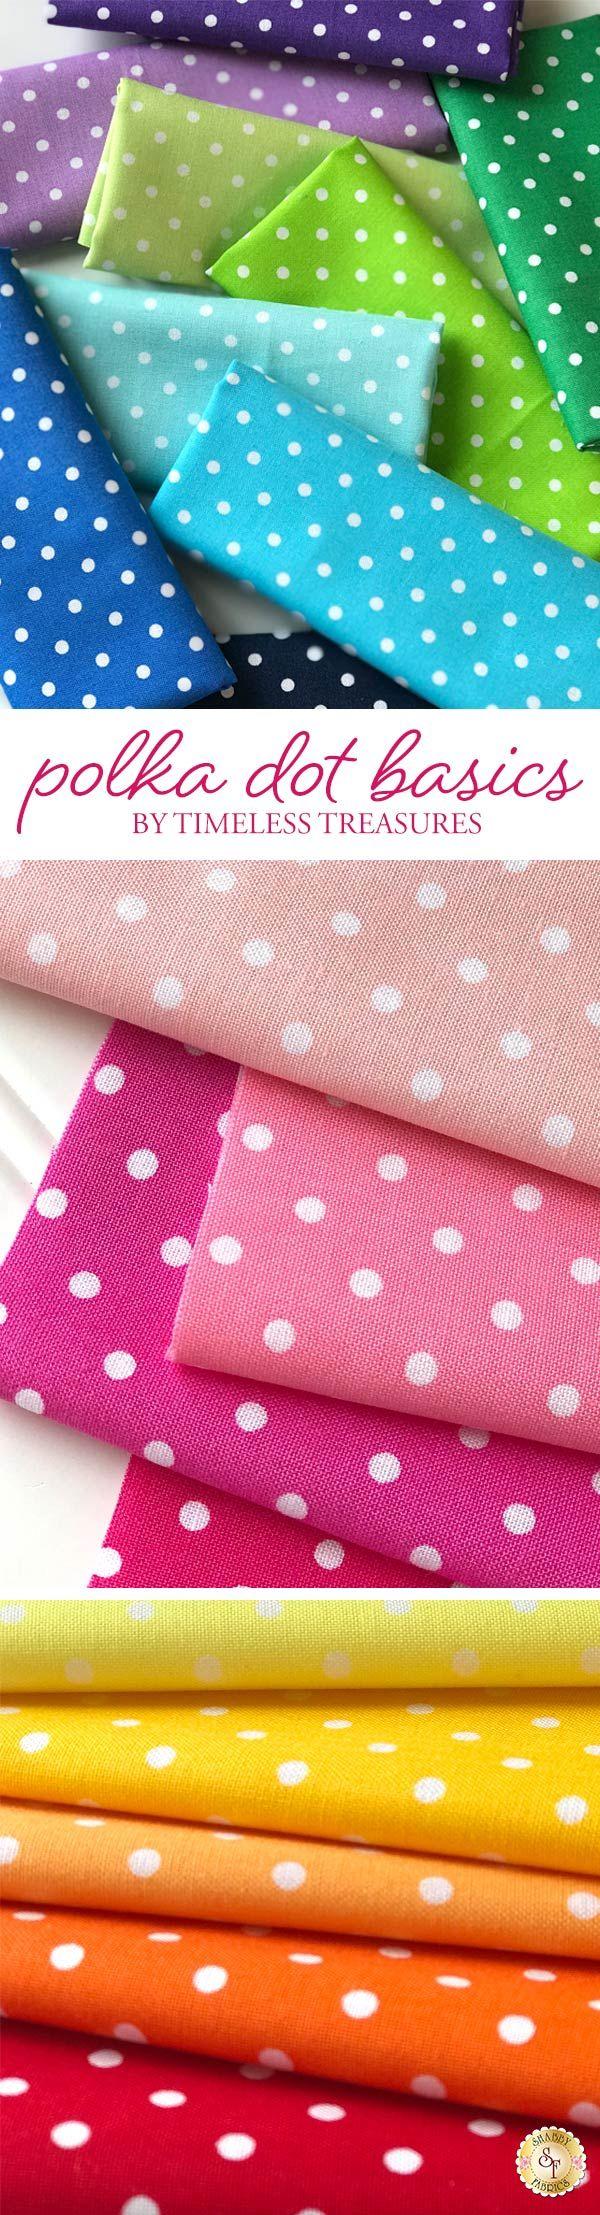 Polka Dot Basics is a lovely collection by Timeless Treasures Fabrics available at Shabby Fabrics